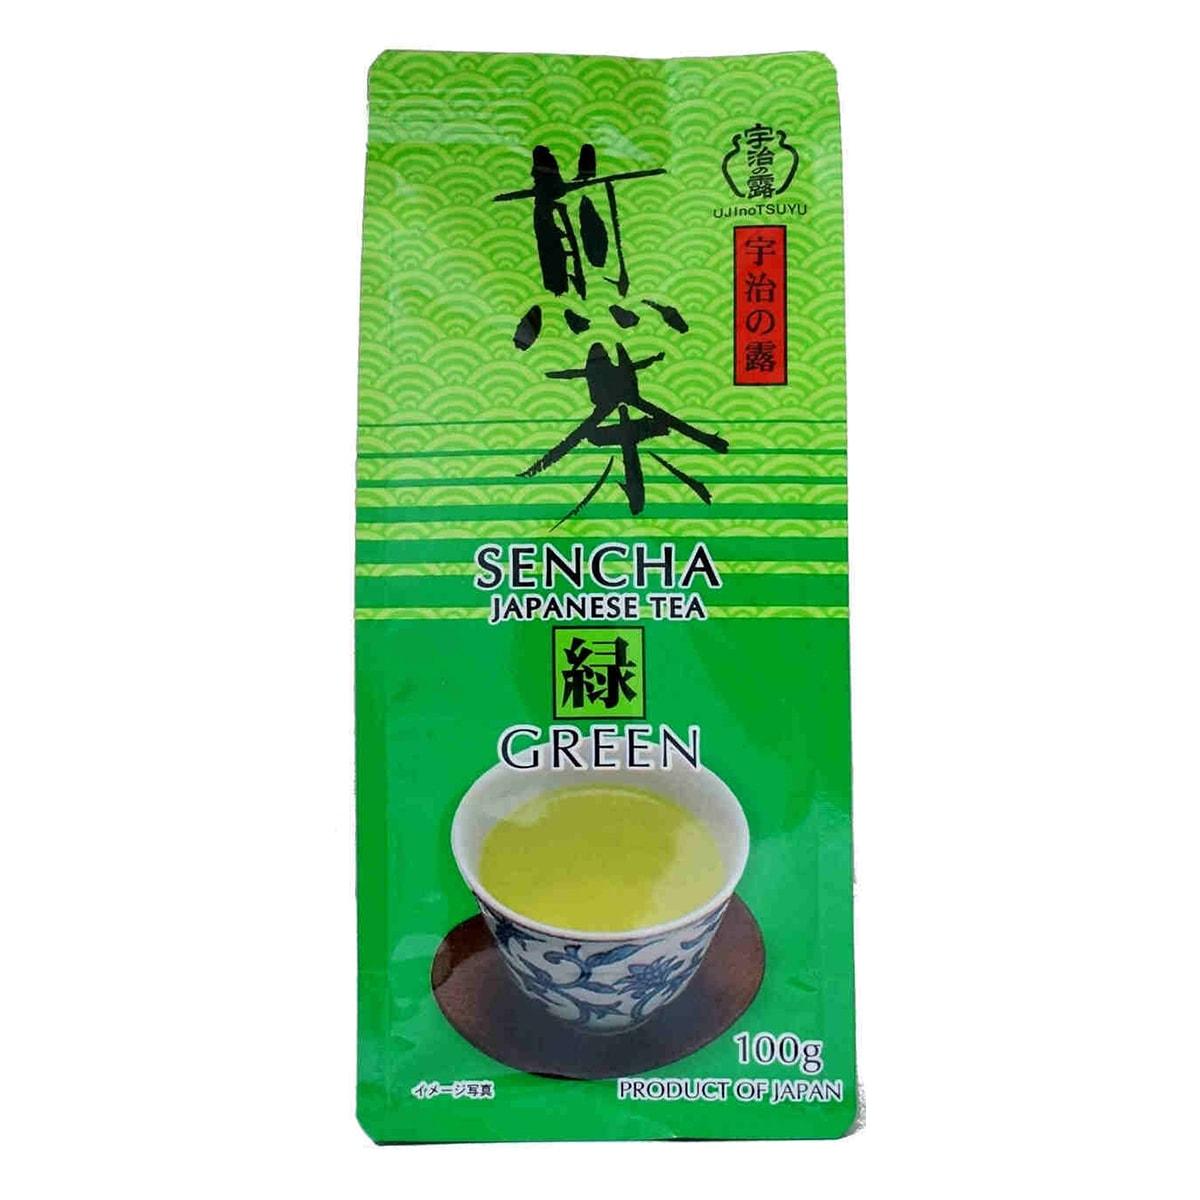 Buy Ujinotsuyu Sencha Green Tea - 100 gm